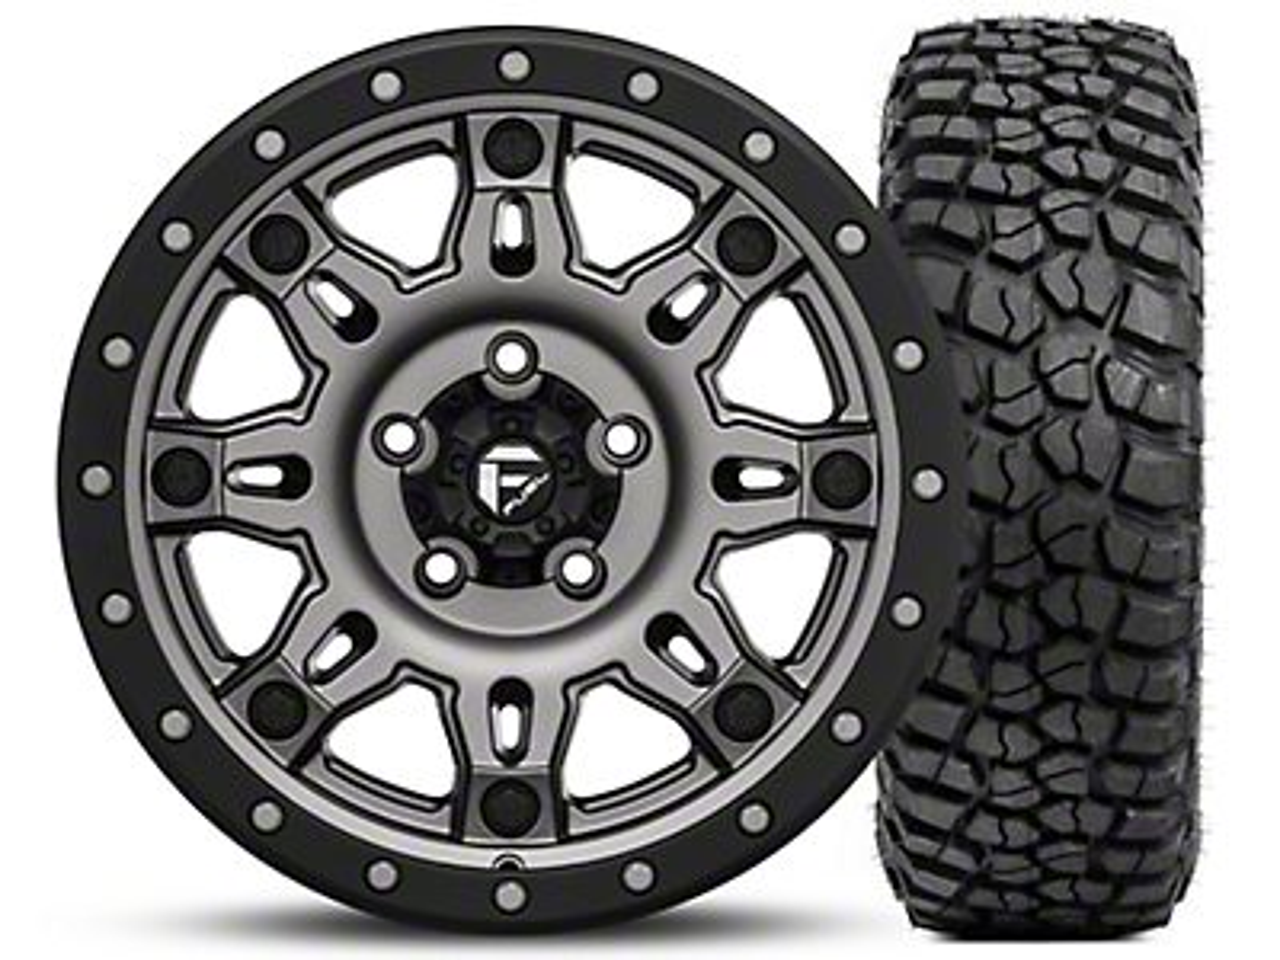 Fuel Wheels Hostage III Gunmetal and Black Wheel 17x9 and BF Goodrich Mud Terrain T/A KM2 35x12.50R17 Kit (07-18 Jeep Wrangler JK; 2018 Jeep Wrangler JL)